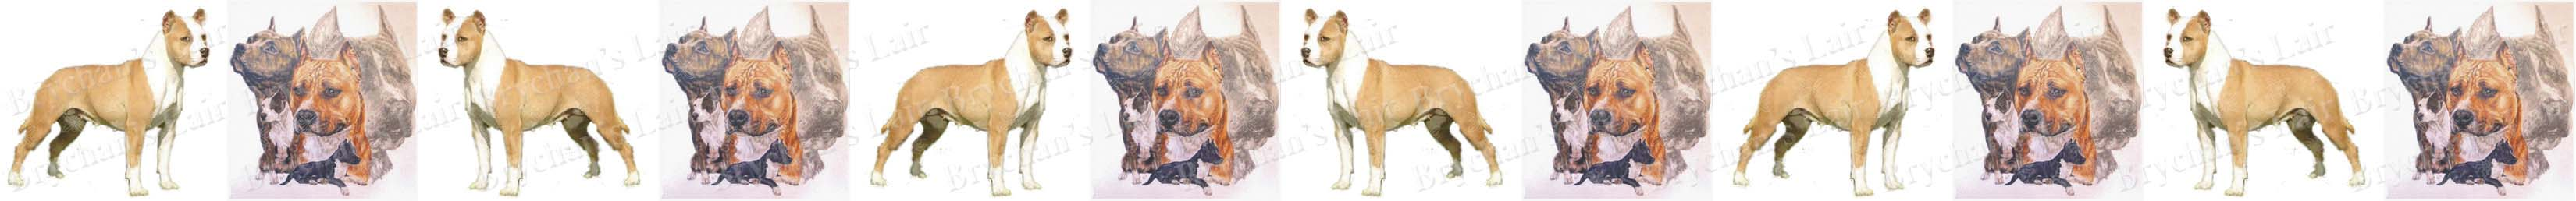 American Staffordshire Terrier Dog Breed Custom Printed Grosgrain Ribbon